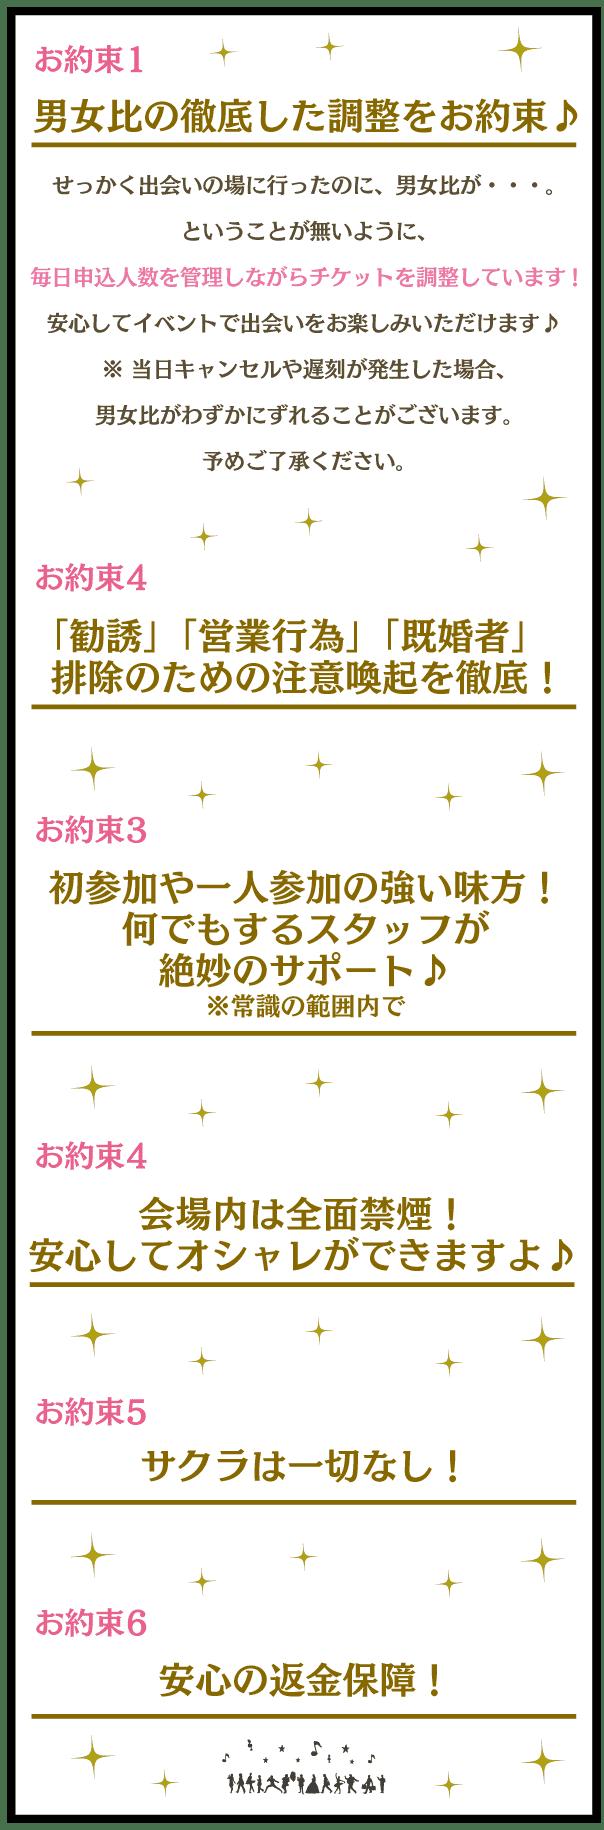 THE-AROUND-THIRTY-PARTY-sozai-06